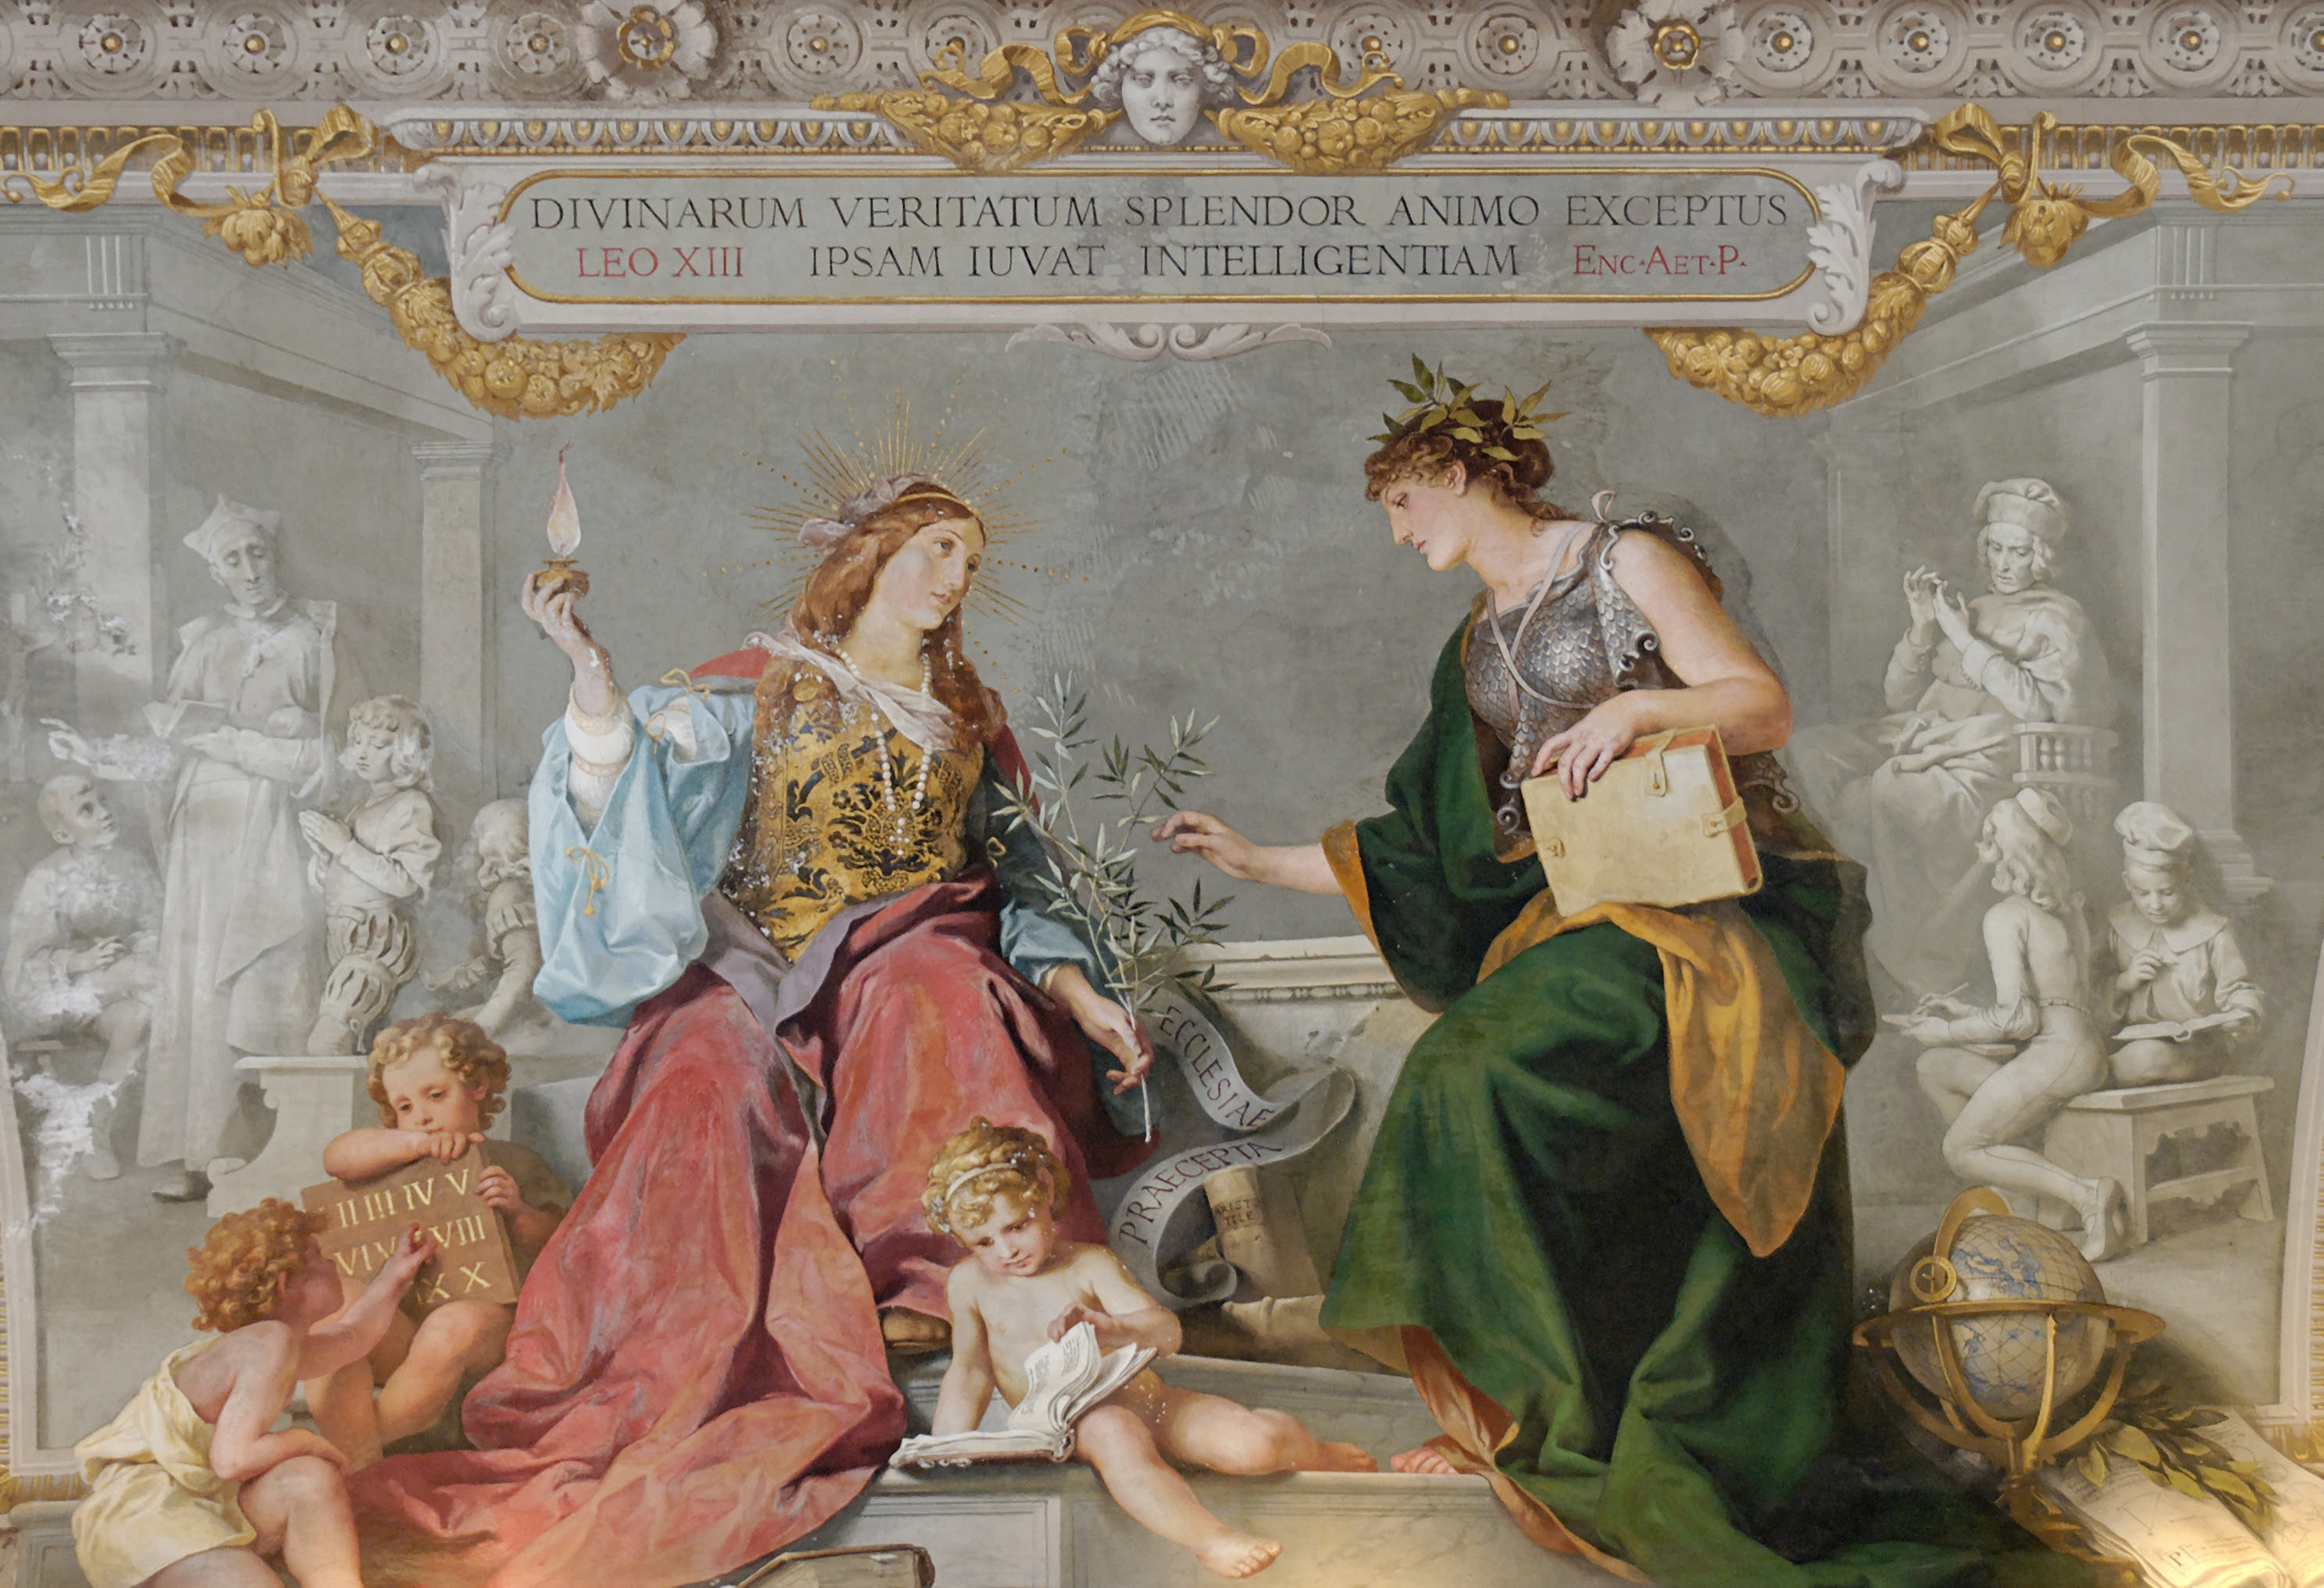 https://upload.wikimedia.org/wikipedia/commons/4/4b/Faith_Reason_Seitz_Galleria_dei_Candelabri.jpg